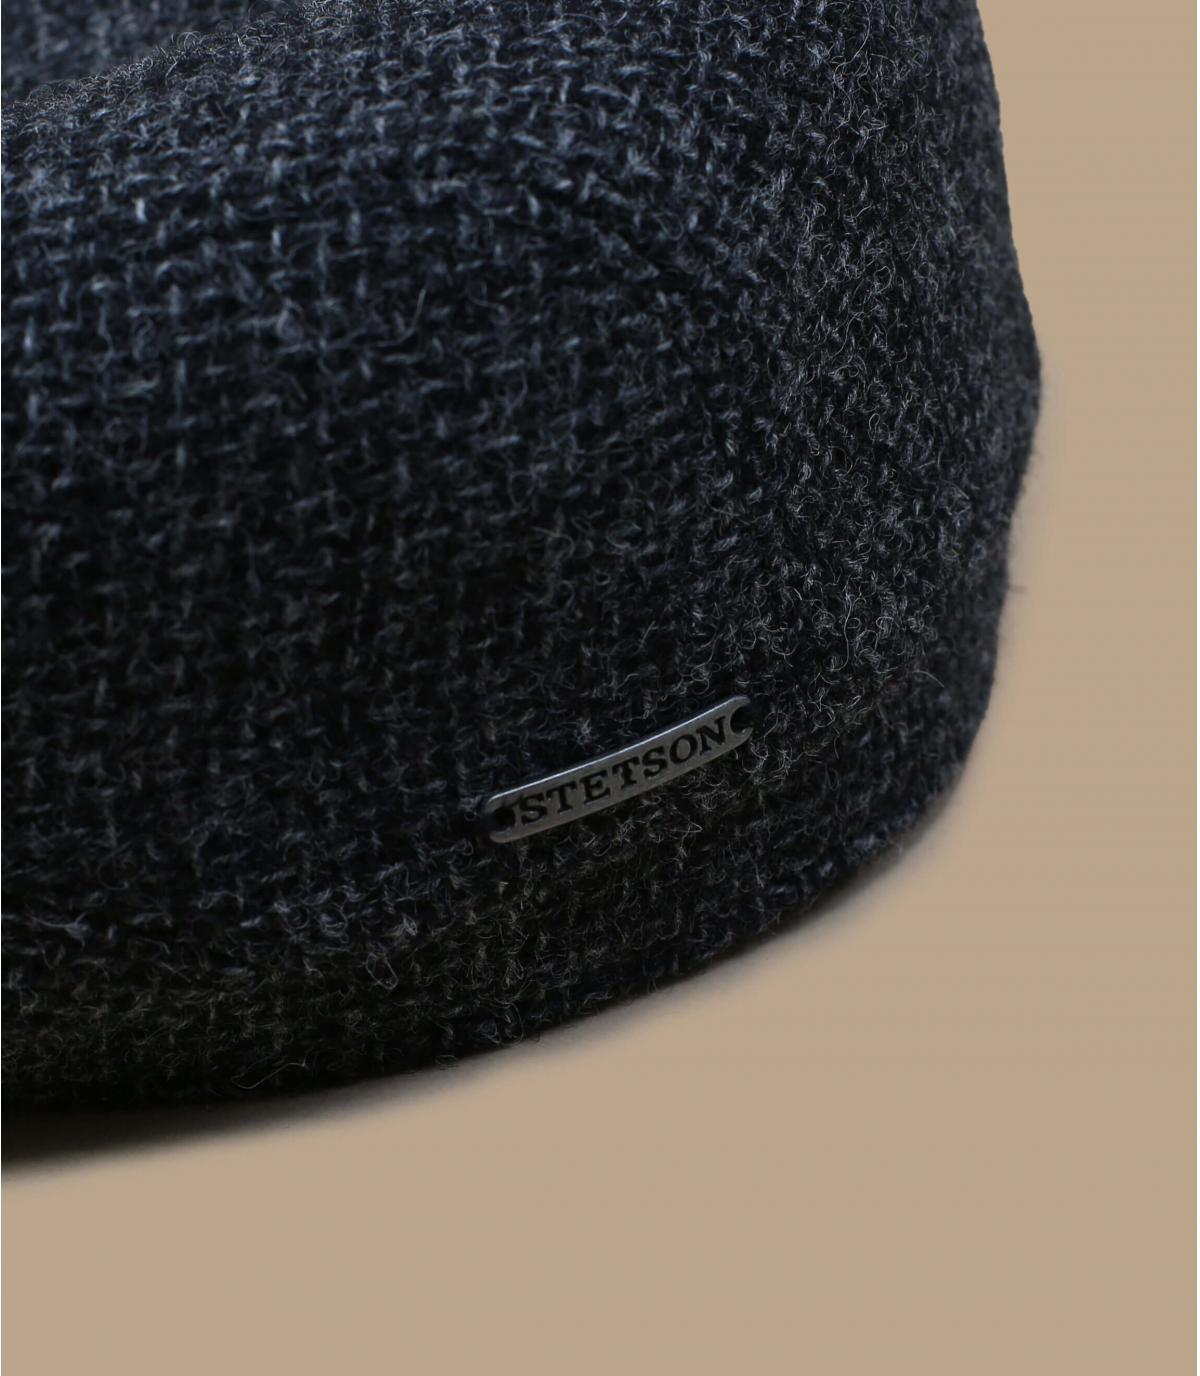 Shetland wol grijze baret